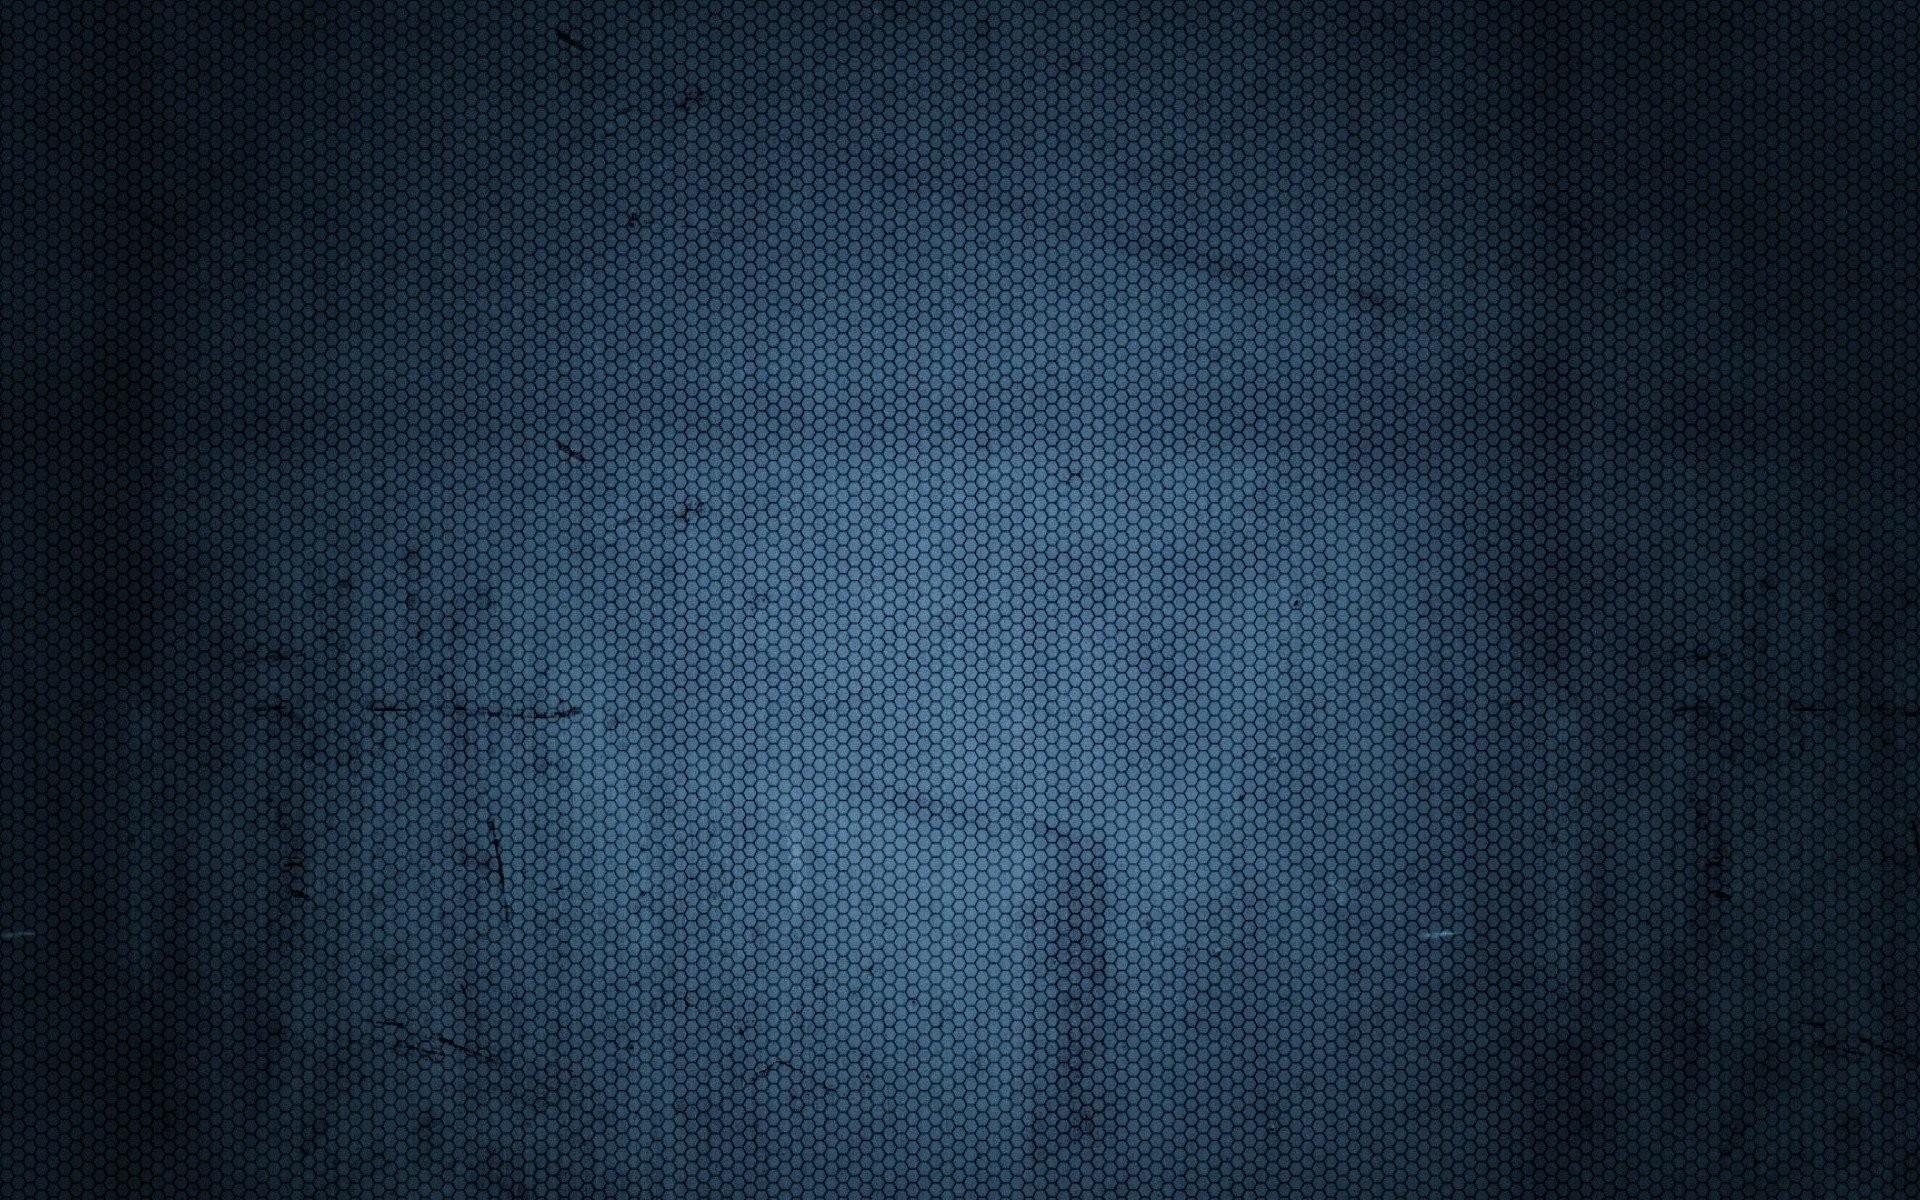 Dark Textures Blue Backgrounds Abstract Art Design Walls